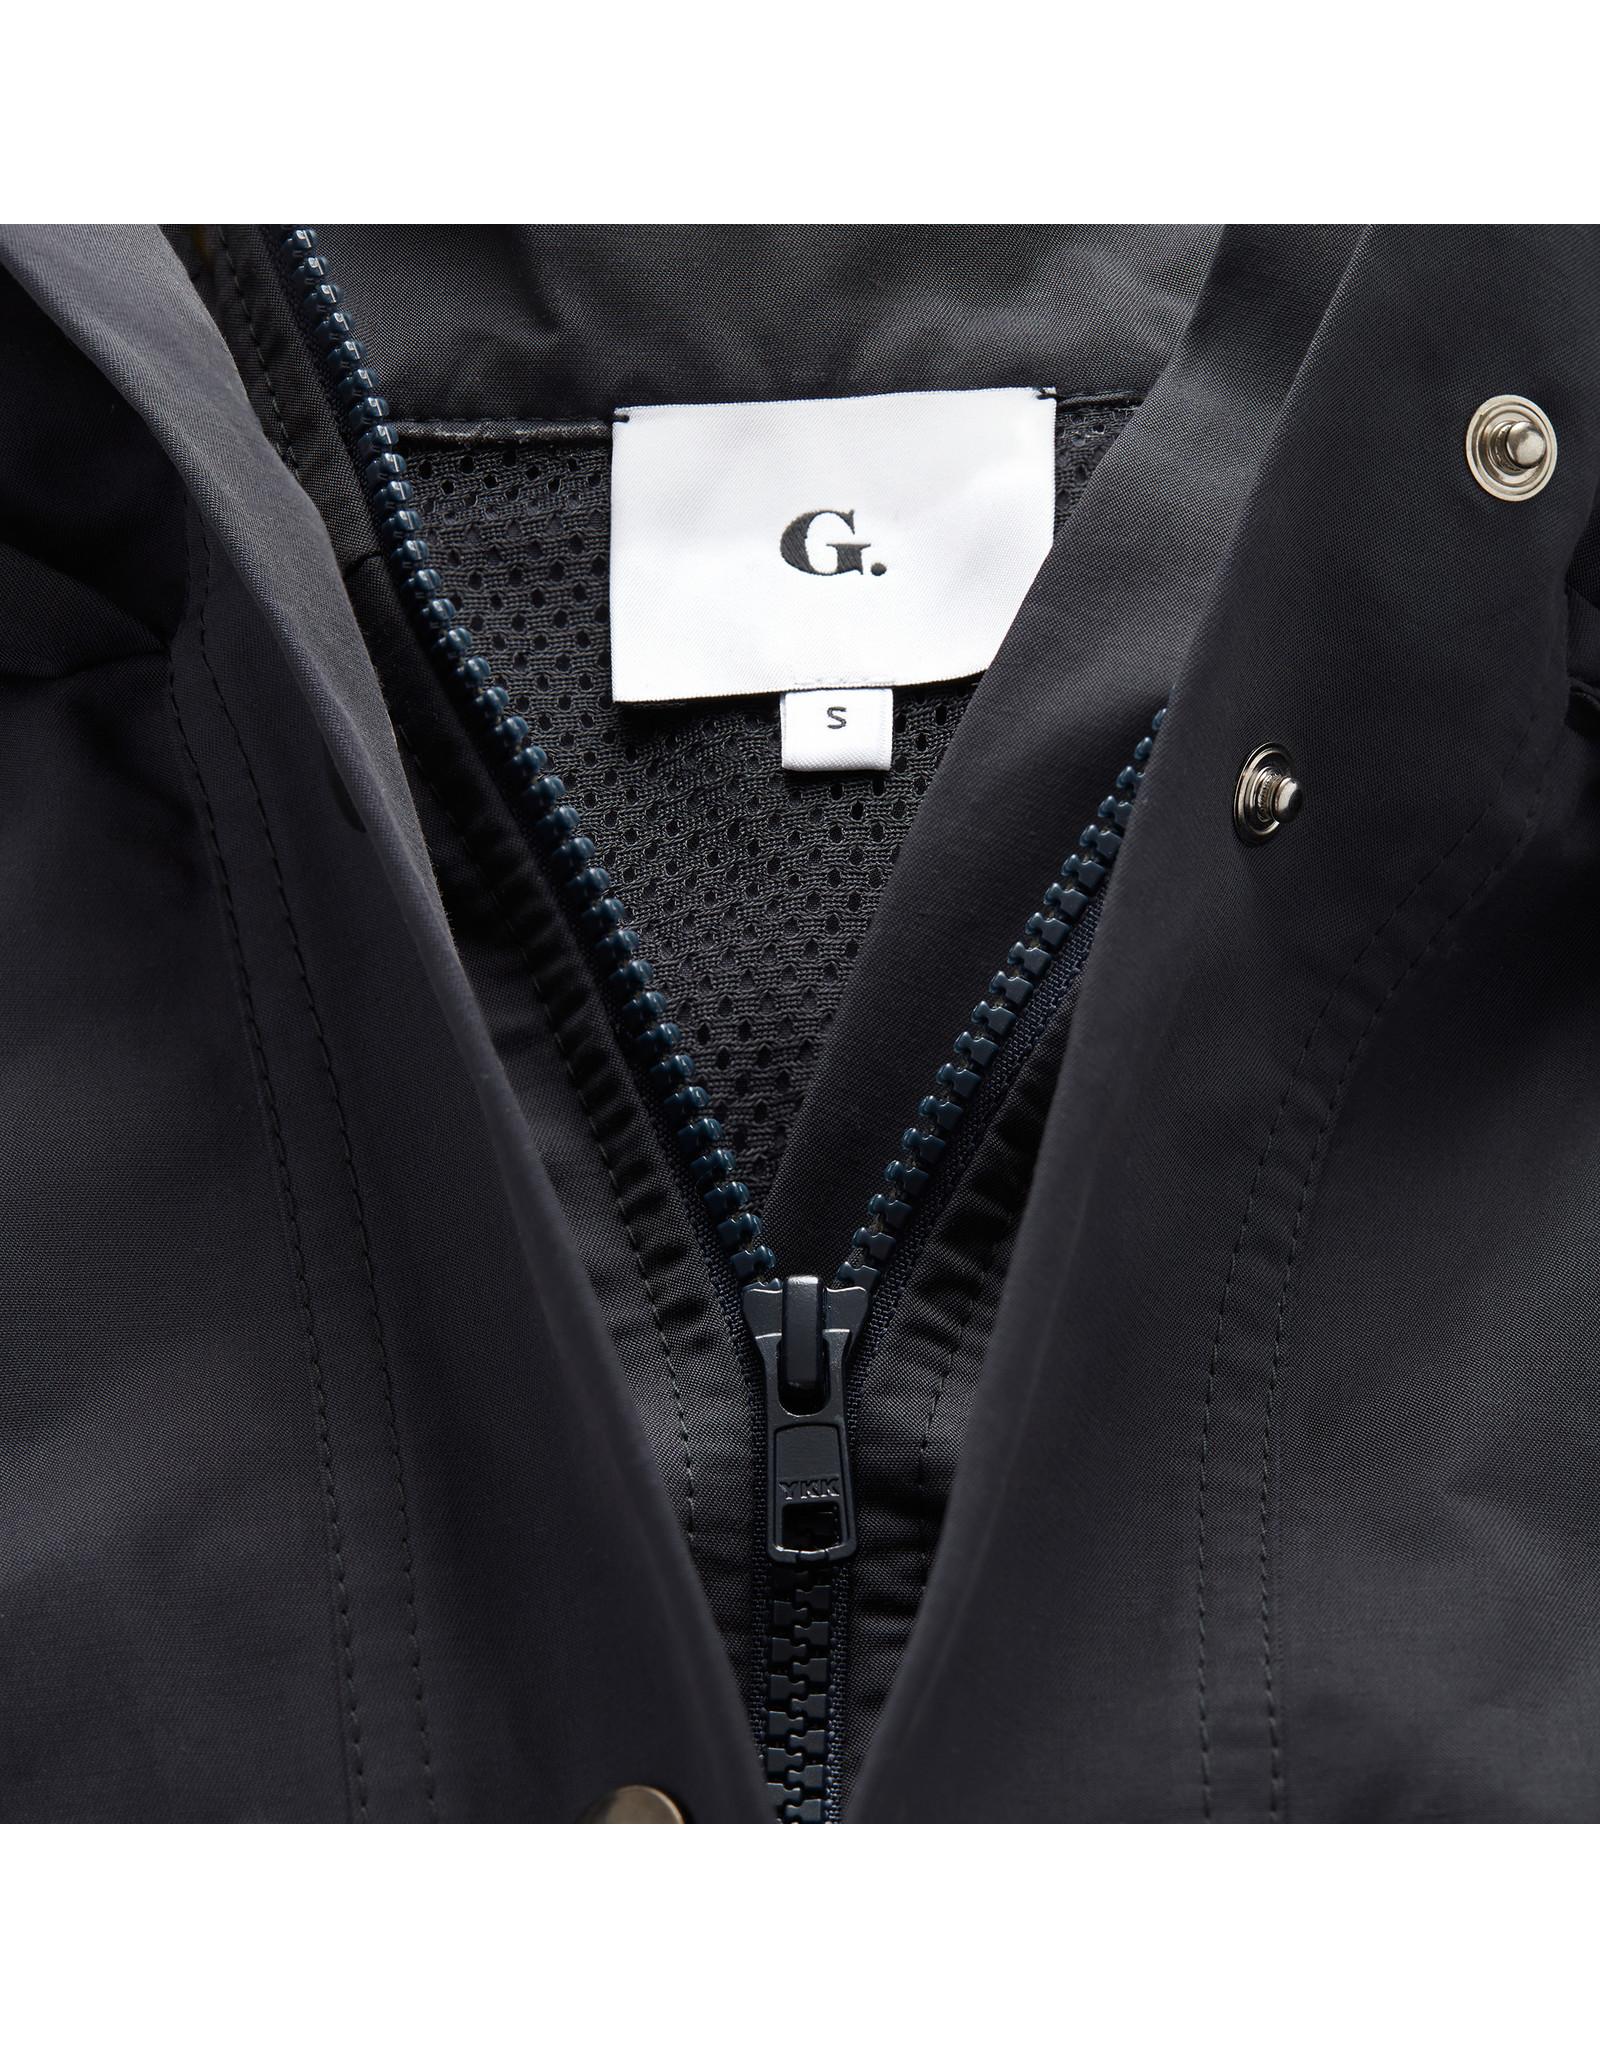 G. Label G. Label Carolyn Utility Performance Jacket (Color: Navy, Size: L)